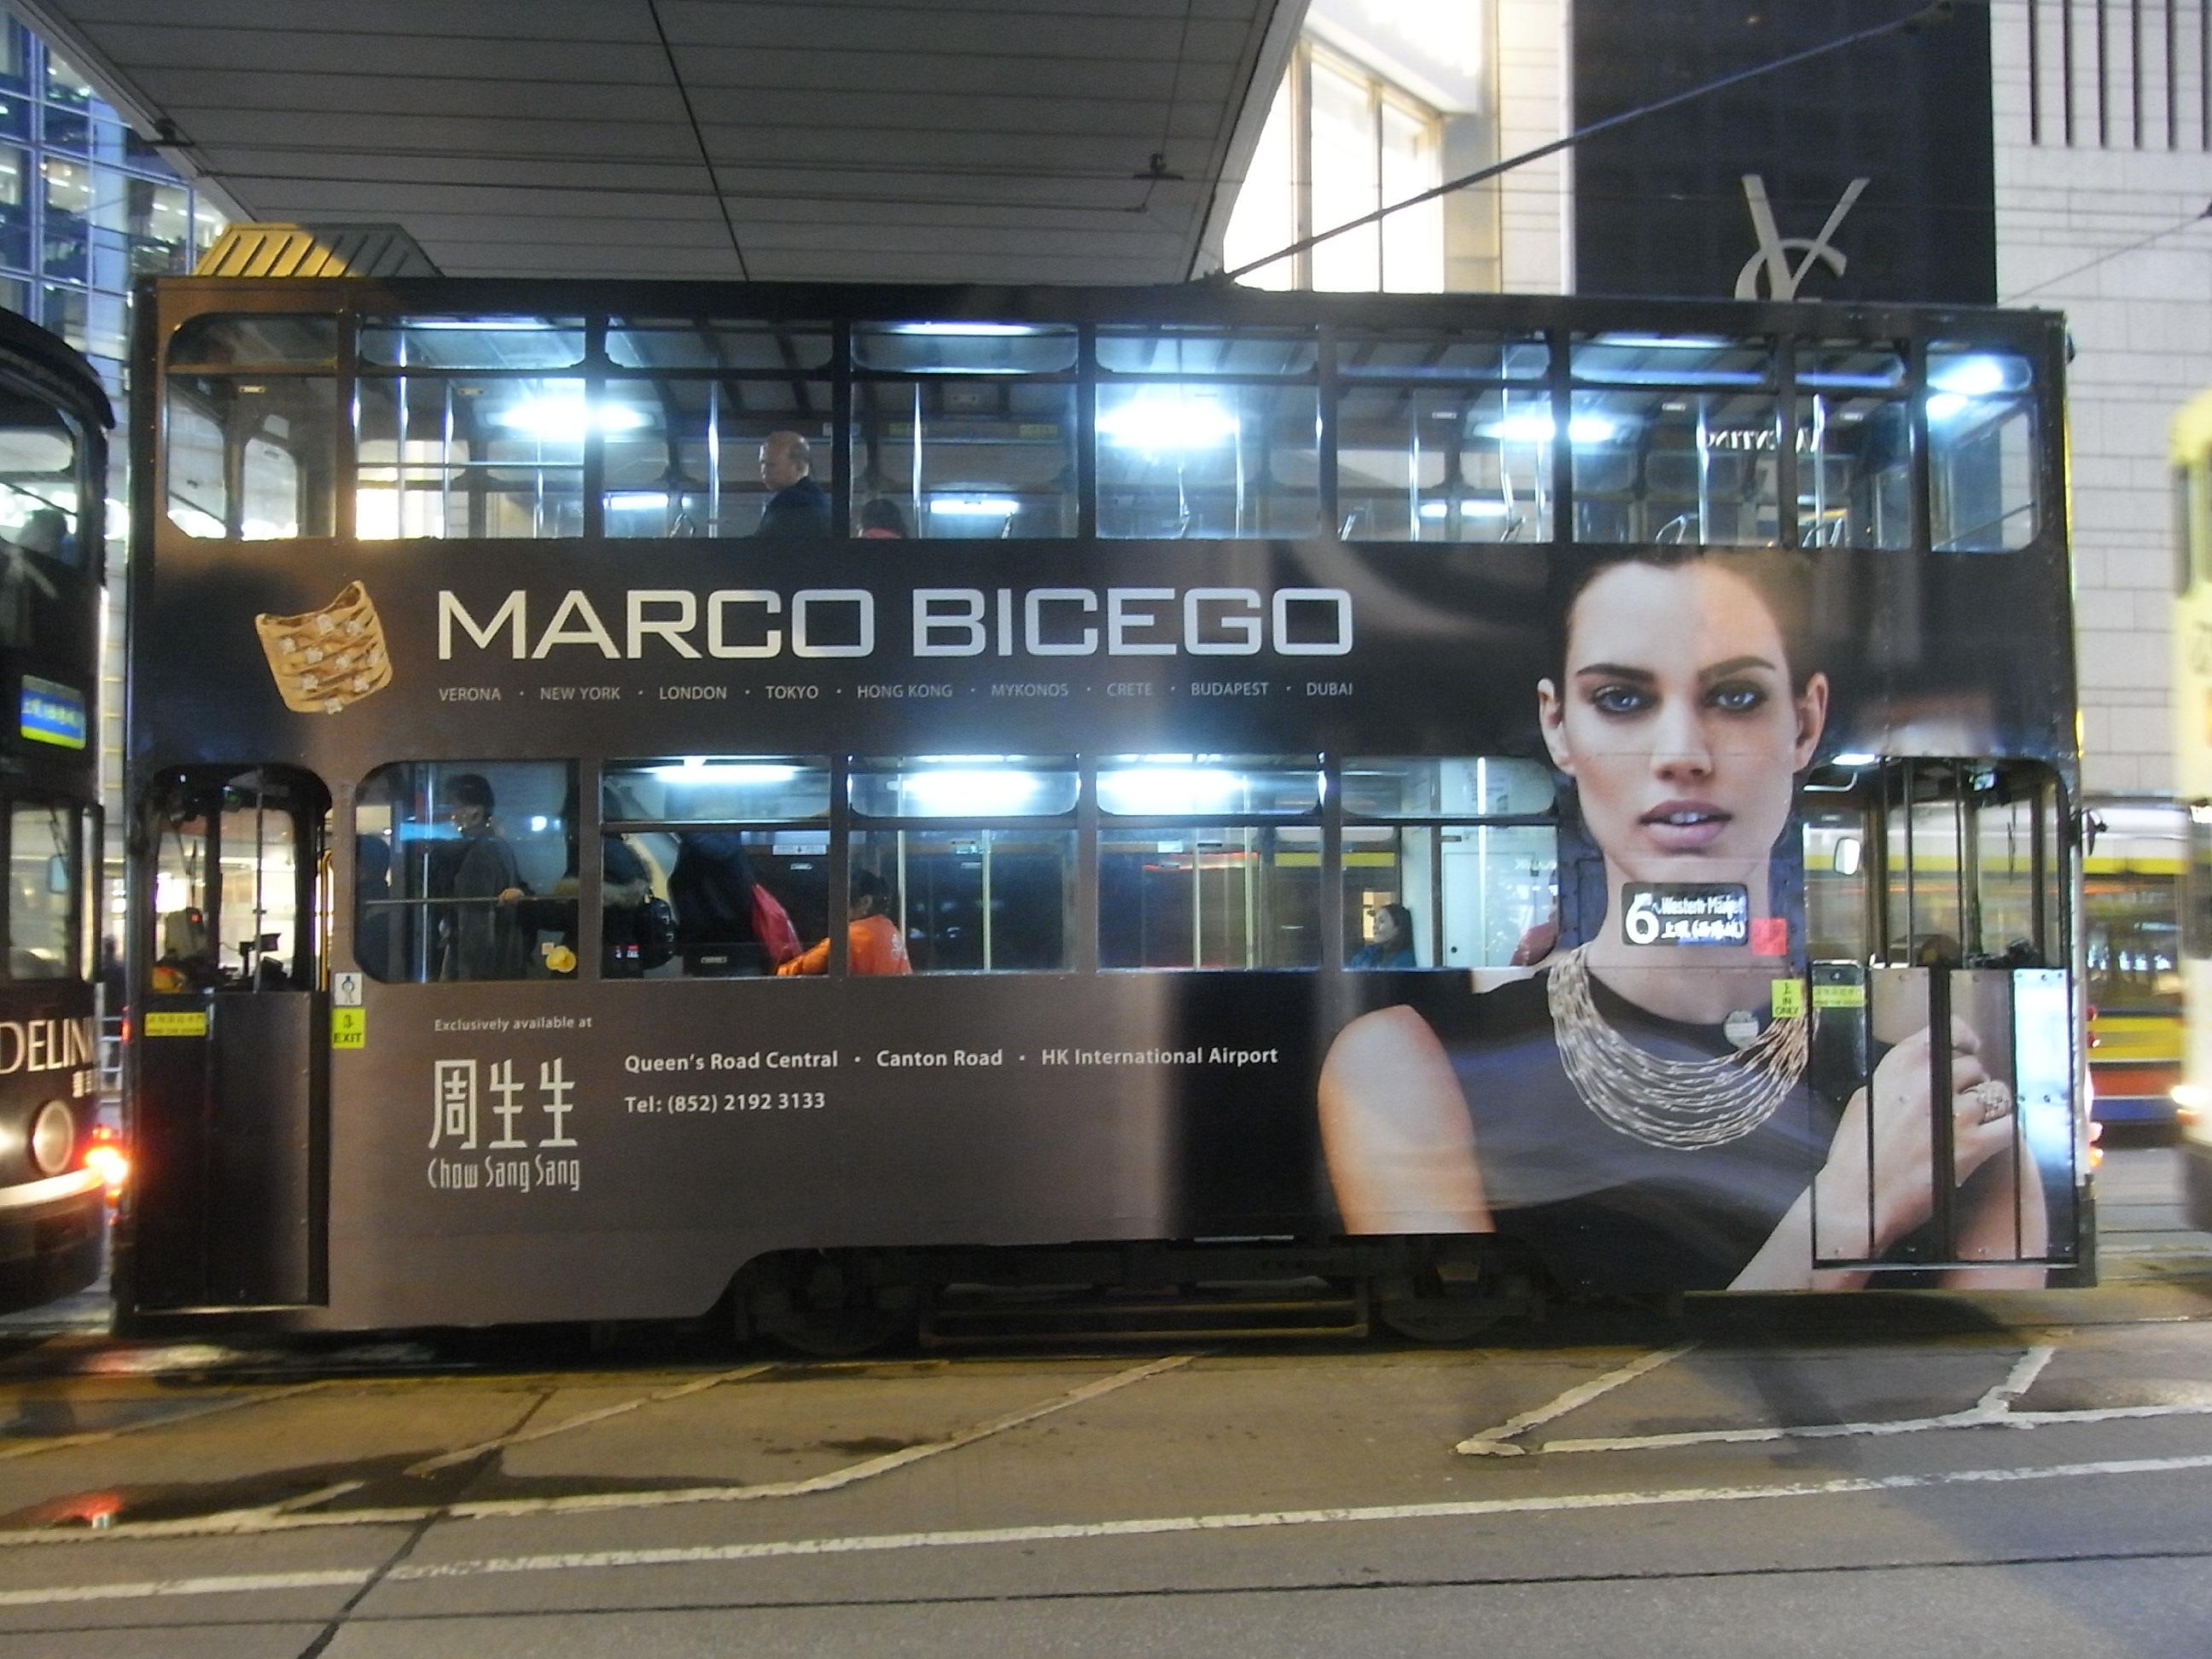 File:HK Central Des Voeux Road evening Tram body ads Chow Sang Sang ...